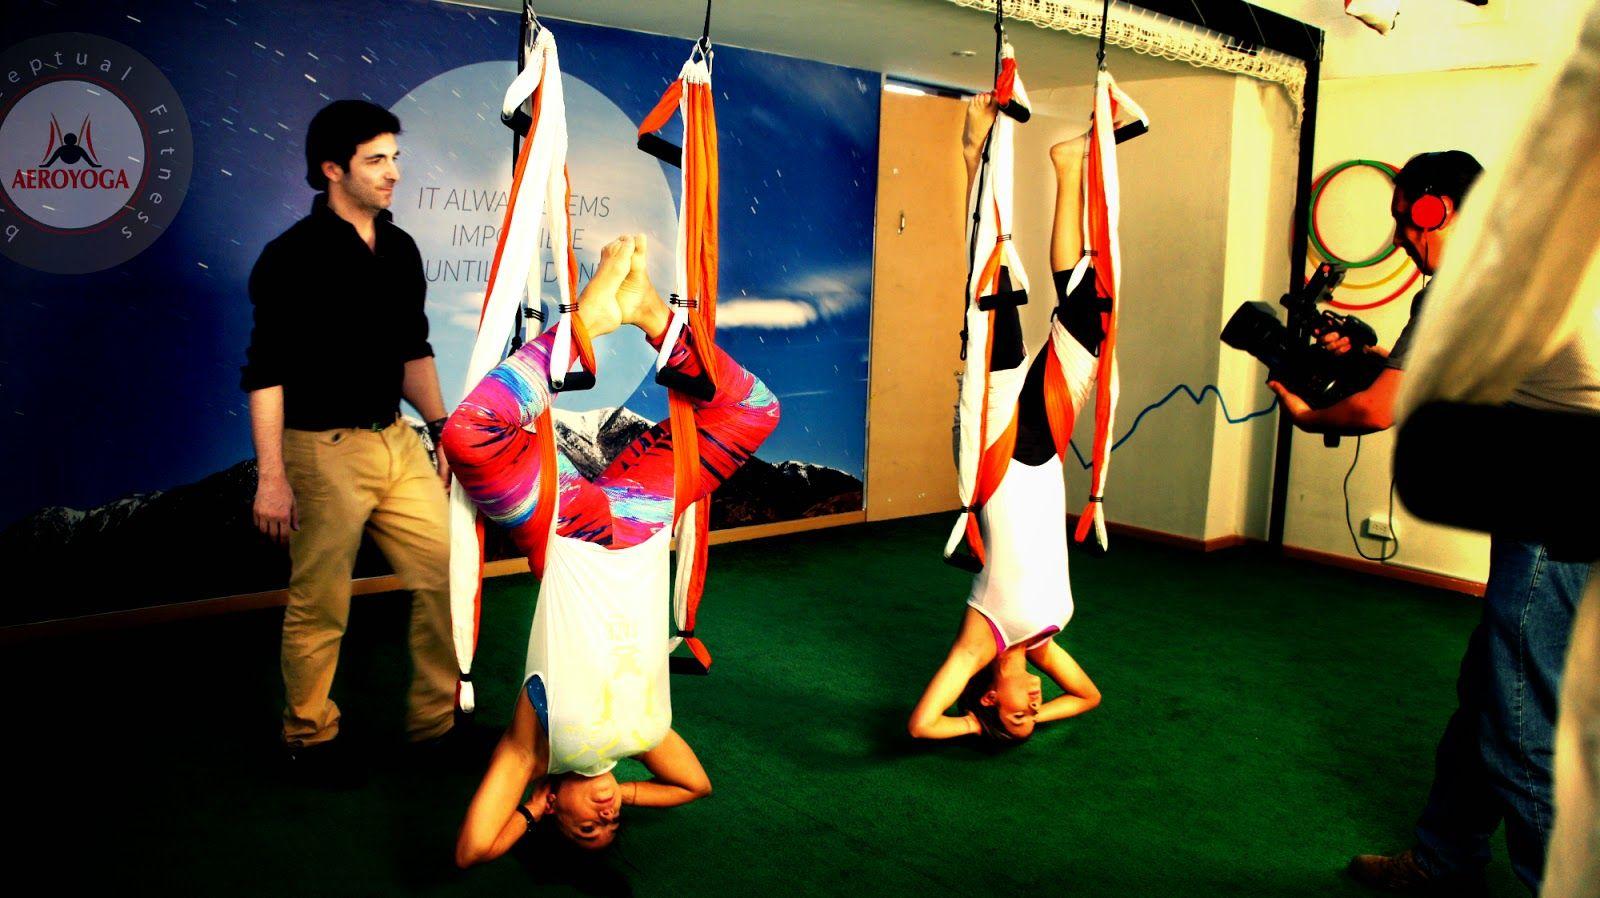 RAFAEL MARTINEZ: AERIAL YOGA TV PRESS HEALTH BEAUTY WELLNESS #yoga #Fitness #rafaelmartinez #teacherstraining #gym #INVERSIONS #AERIALYOGA #Aerial #aerien #luft #yogaacrobatico #acro #ACROBATIC #acrobatico #pilatesaereo #Pilates #formacion #certificación #fly #volar #aire #AIR #vaihayasa